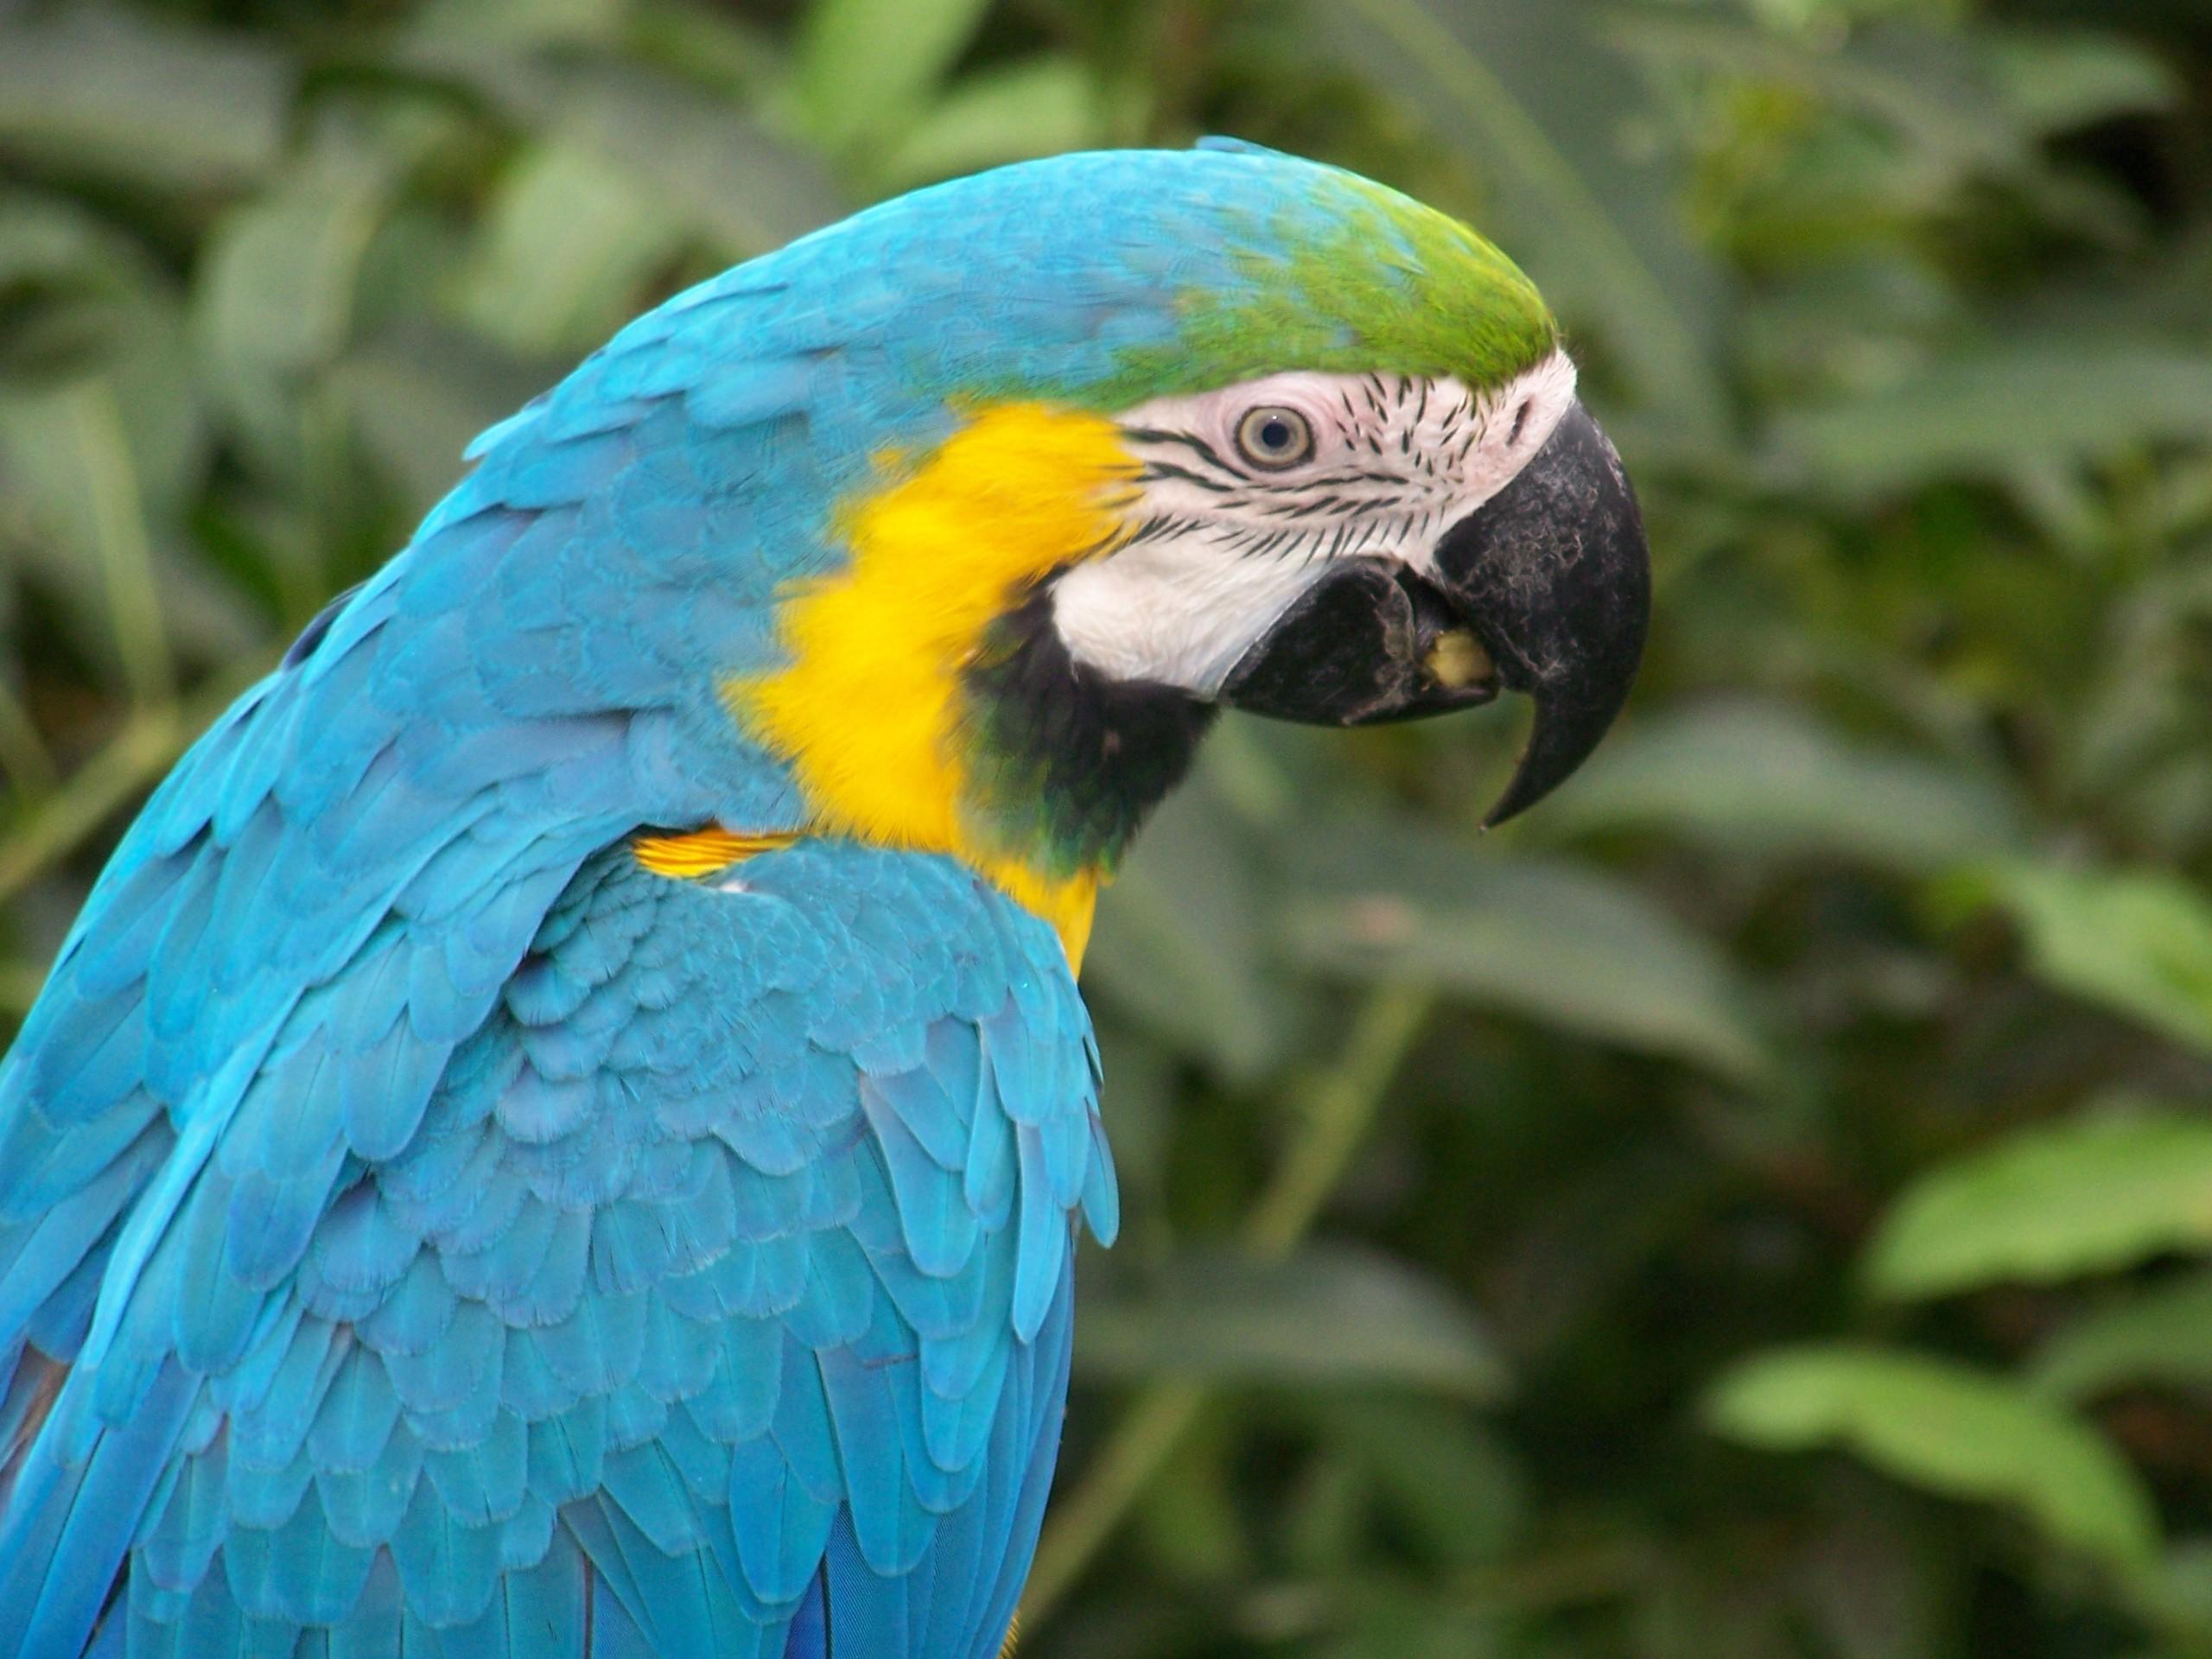 Blue Macaw Parrot 2560x1920 Wallpaper